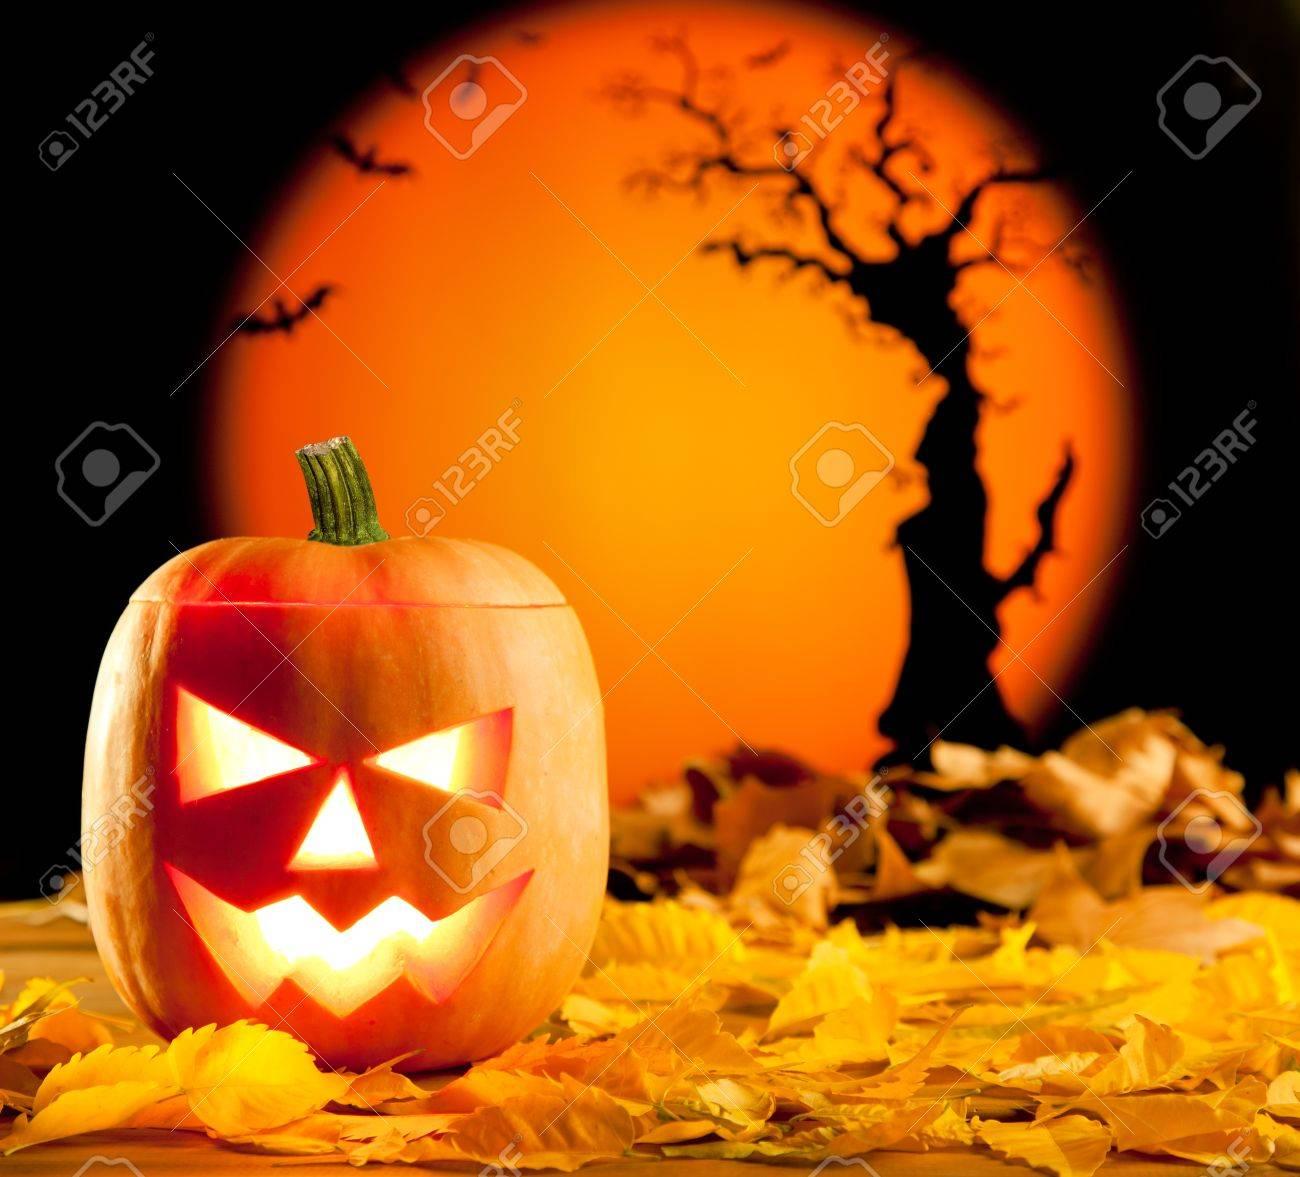 Halloween orange pumpkin lantern with autumn leaves Stock Photo - 10838063